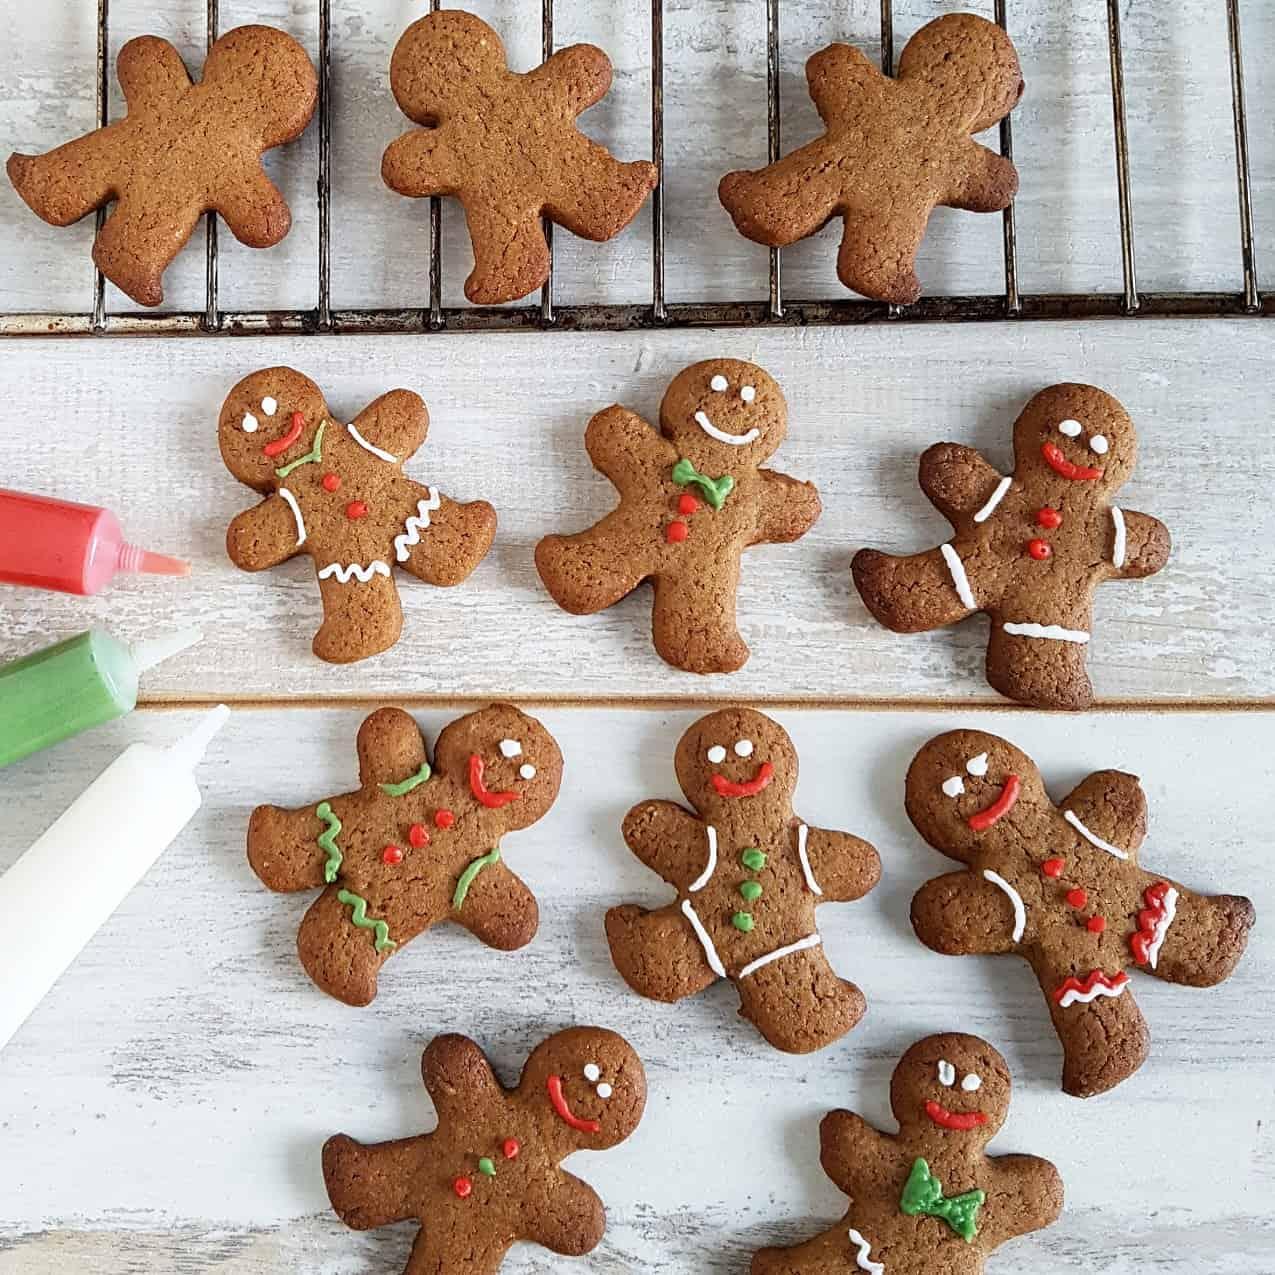 Gingerbread mannetjes maken is leuk!